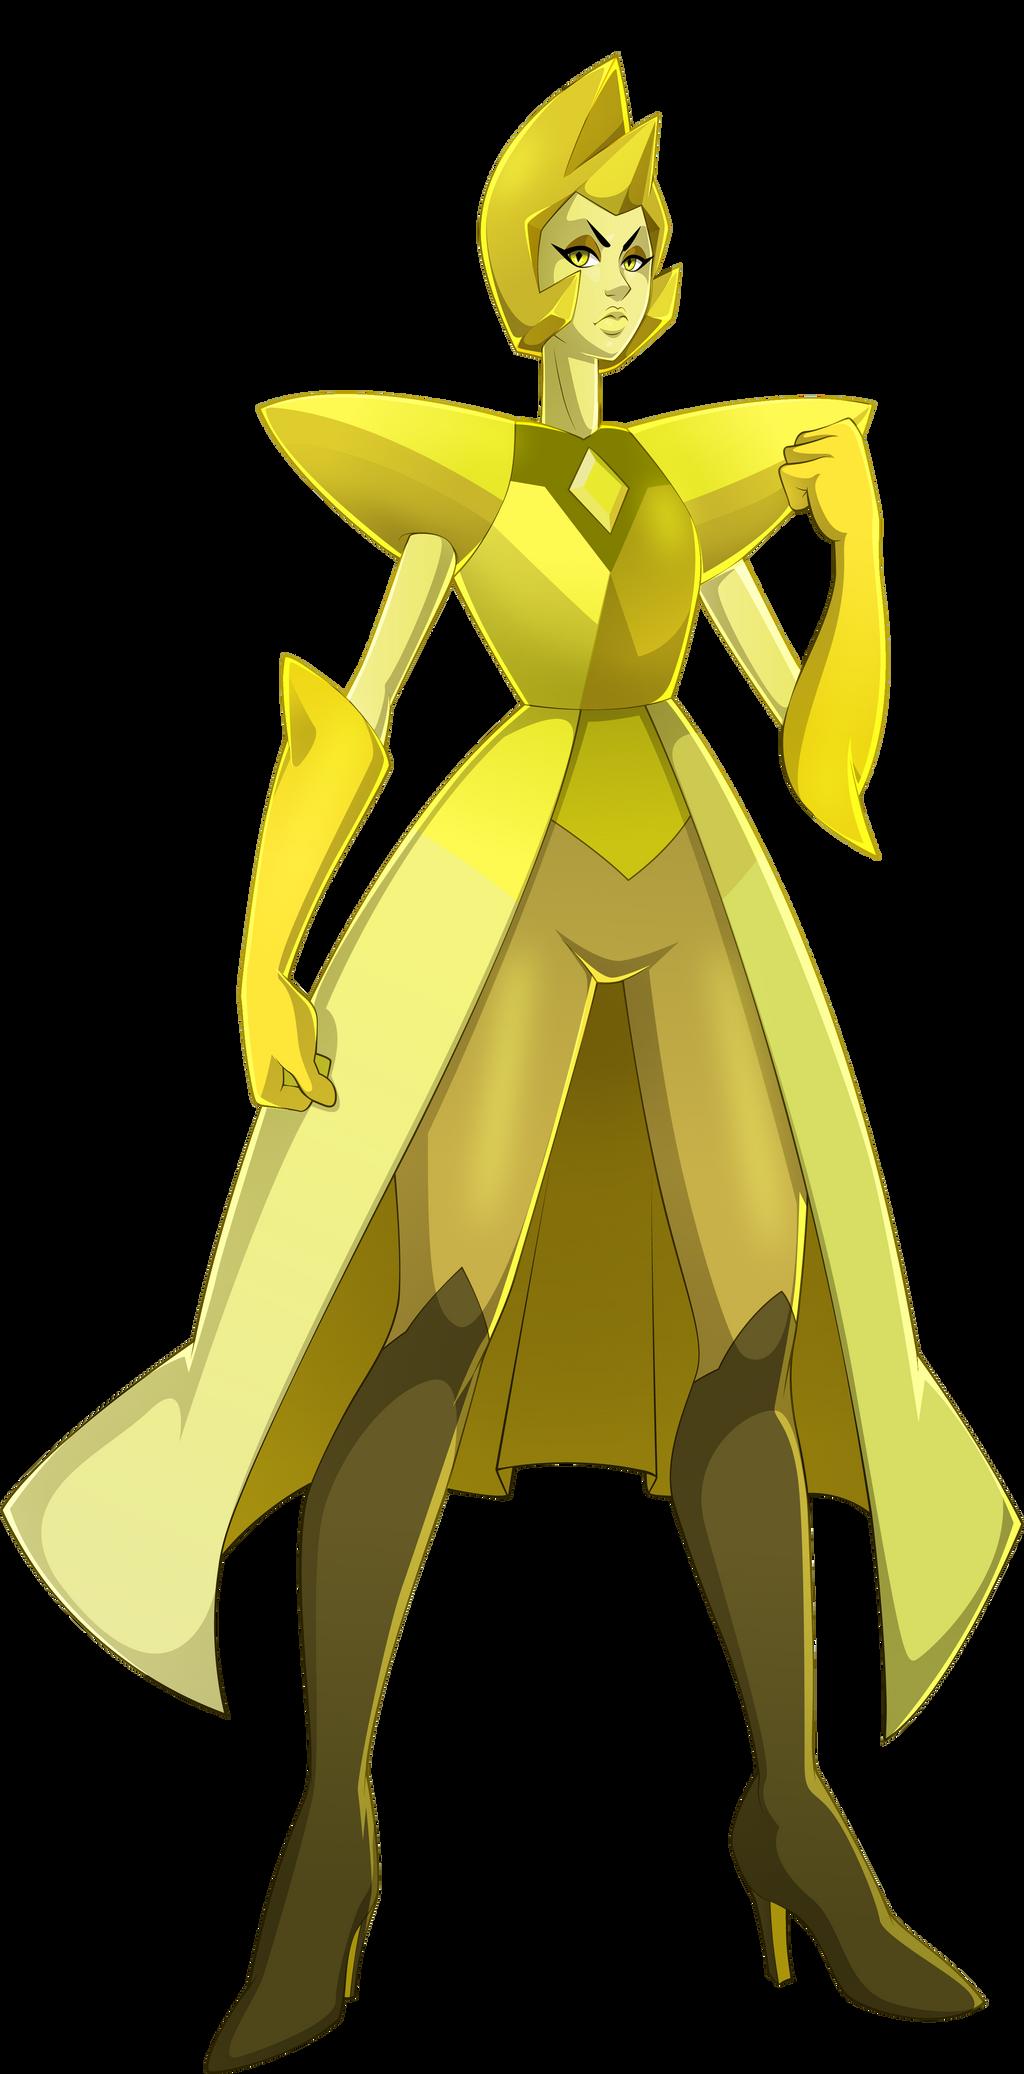 Yellow Diamond by sparks220stars on DeviantArt